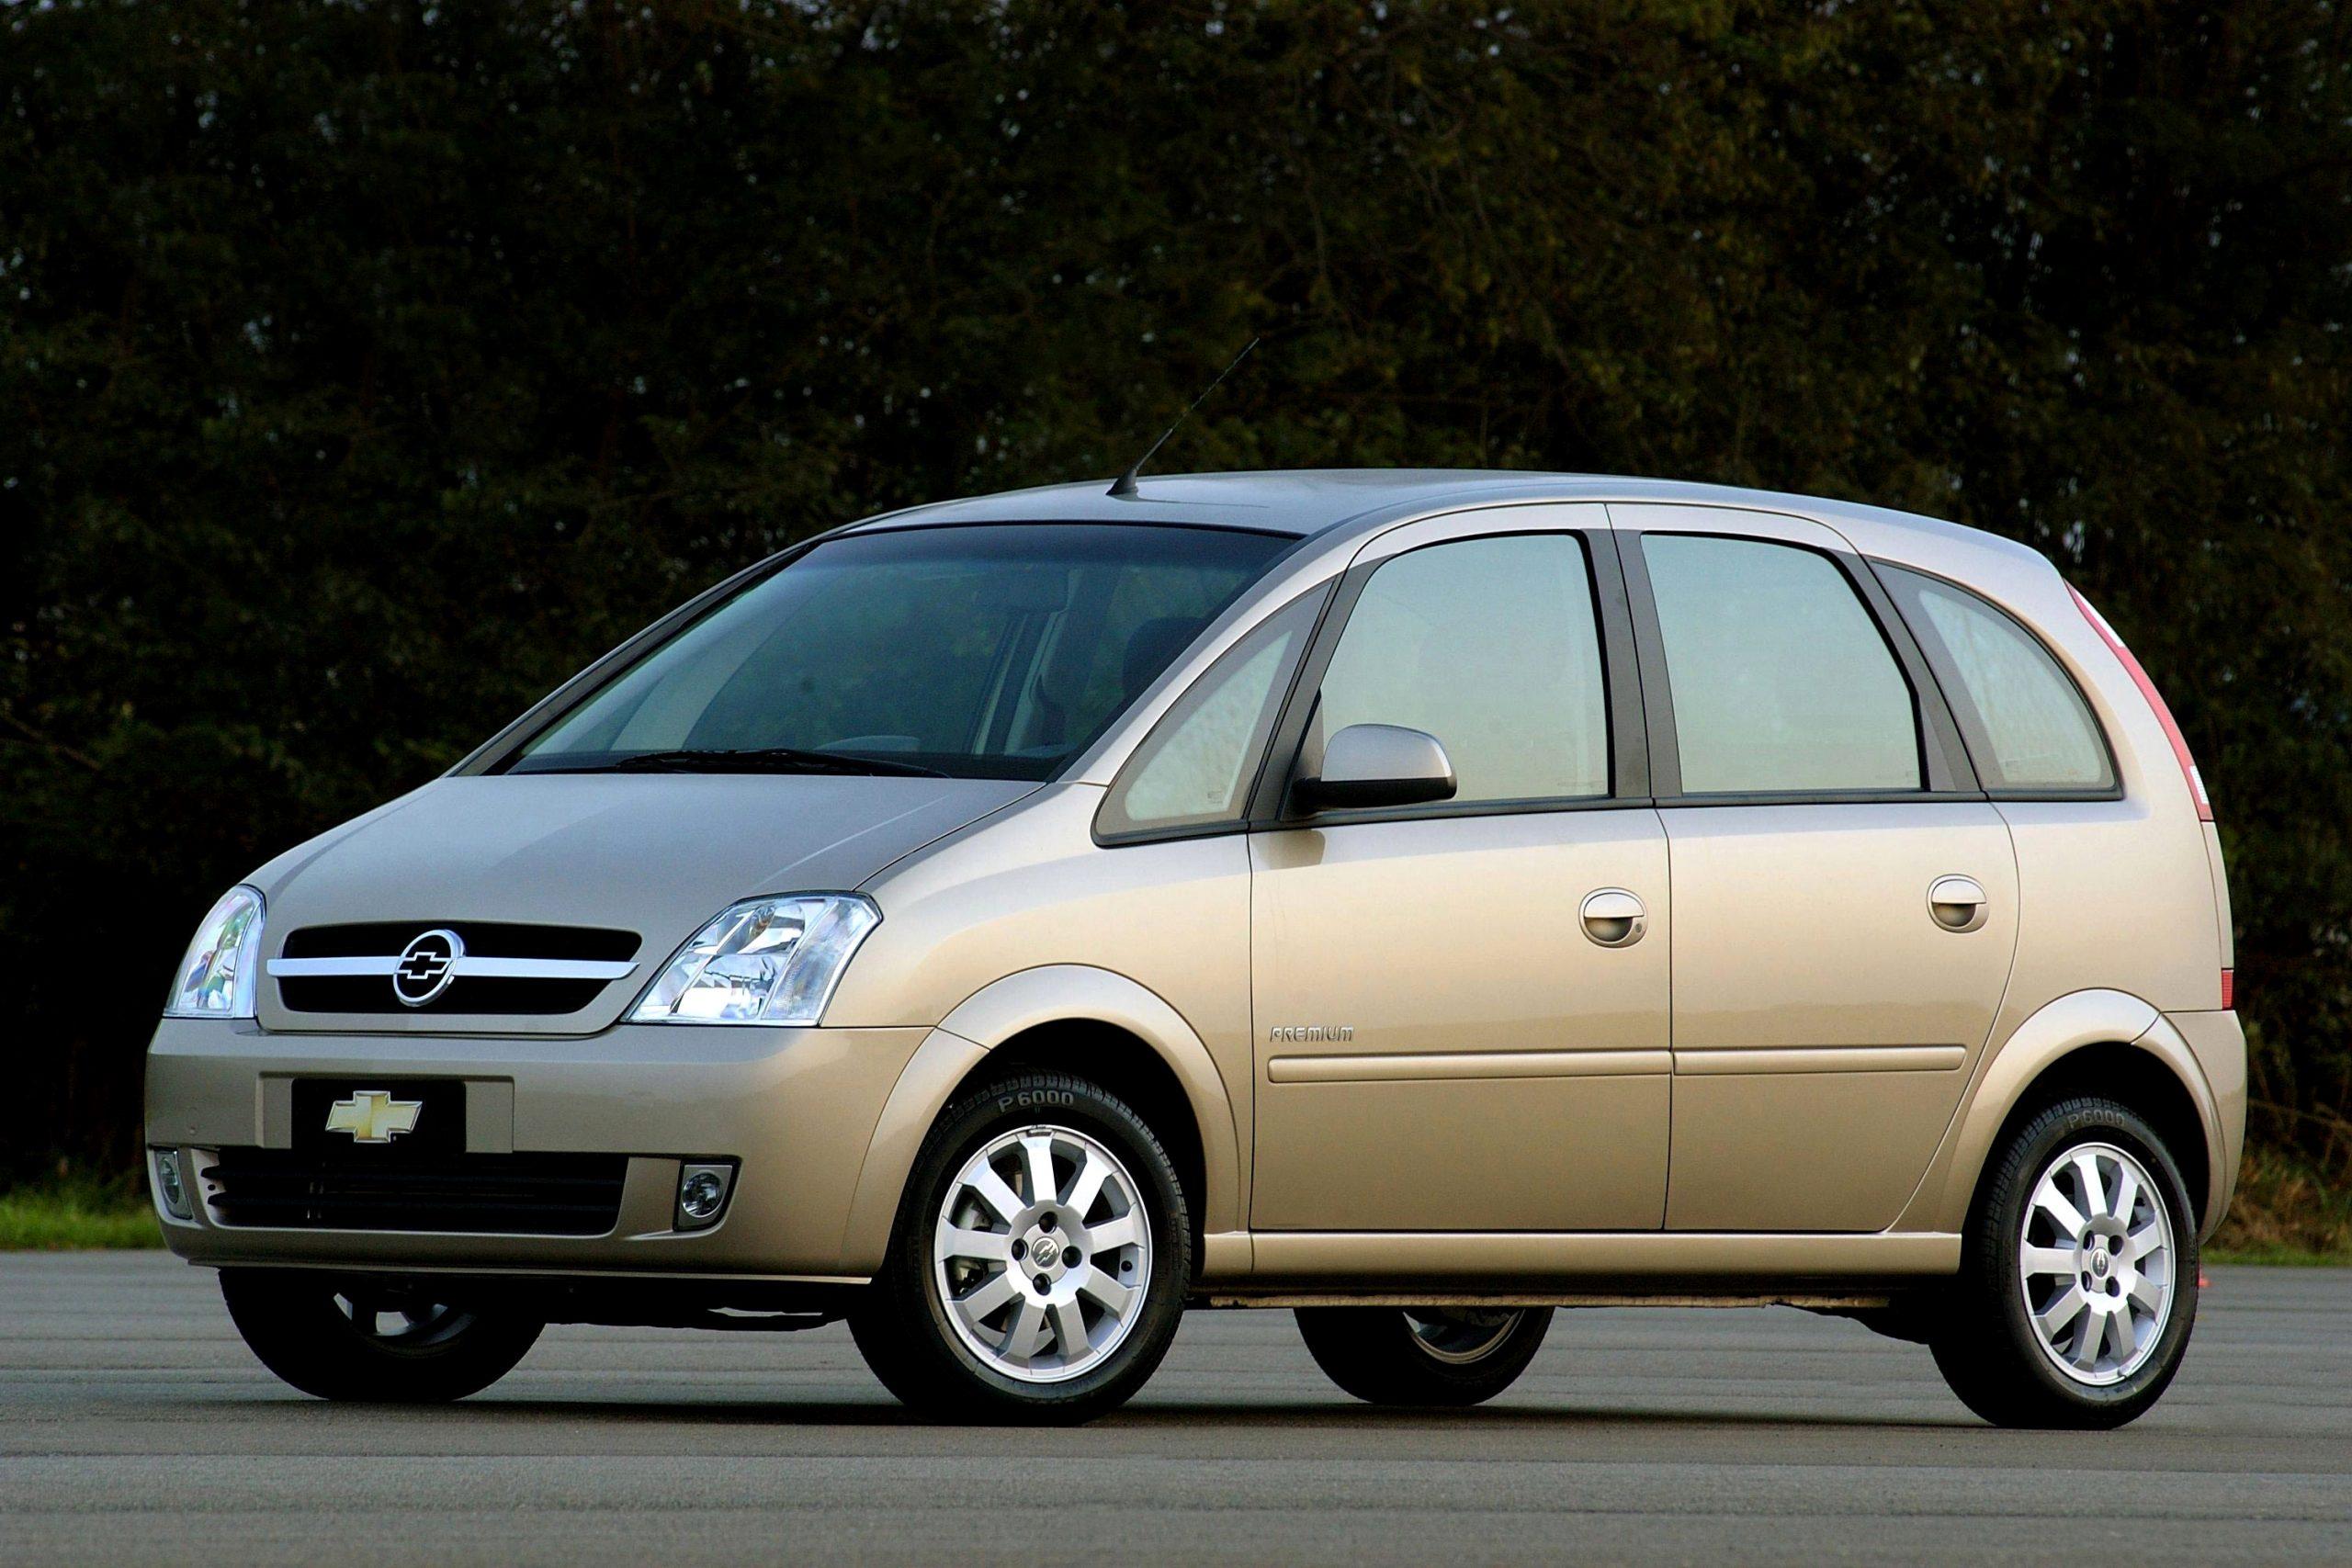 minivan chevrolet meriva premium 2004 dourada lateral